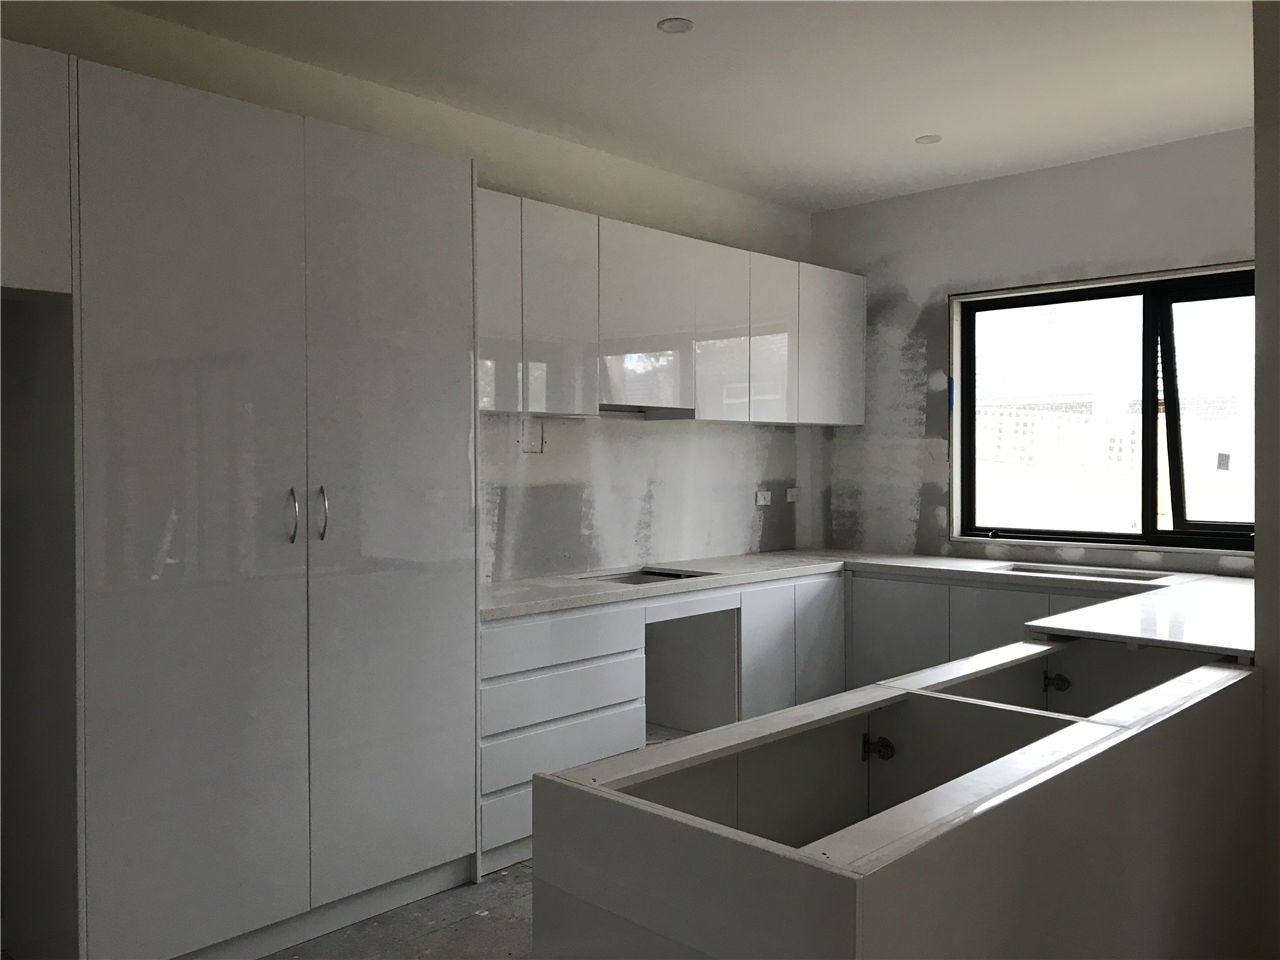 Australian(Melbourne) Full Custom Kitchen Cabinet Project-ORE Cabinet Project - 1